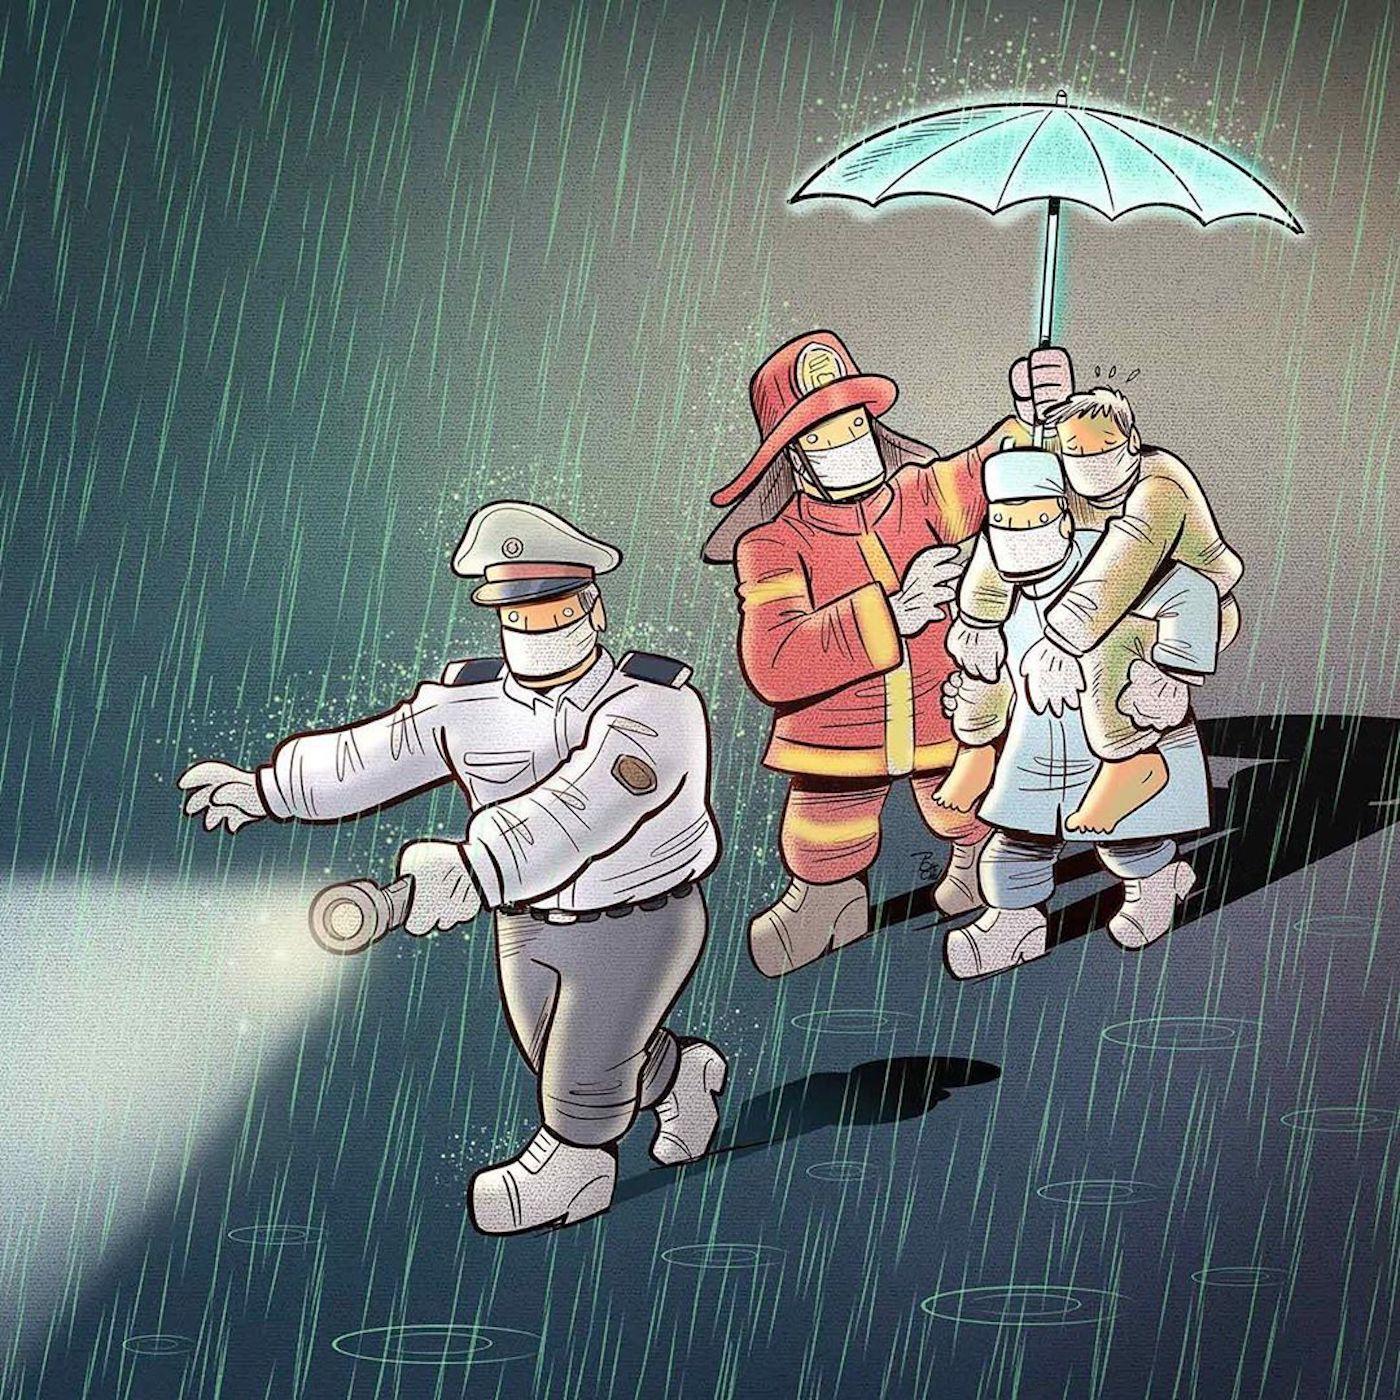 illustrations-hommage-personnel-soignant-alireza-pakdel-9